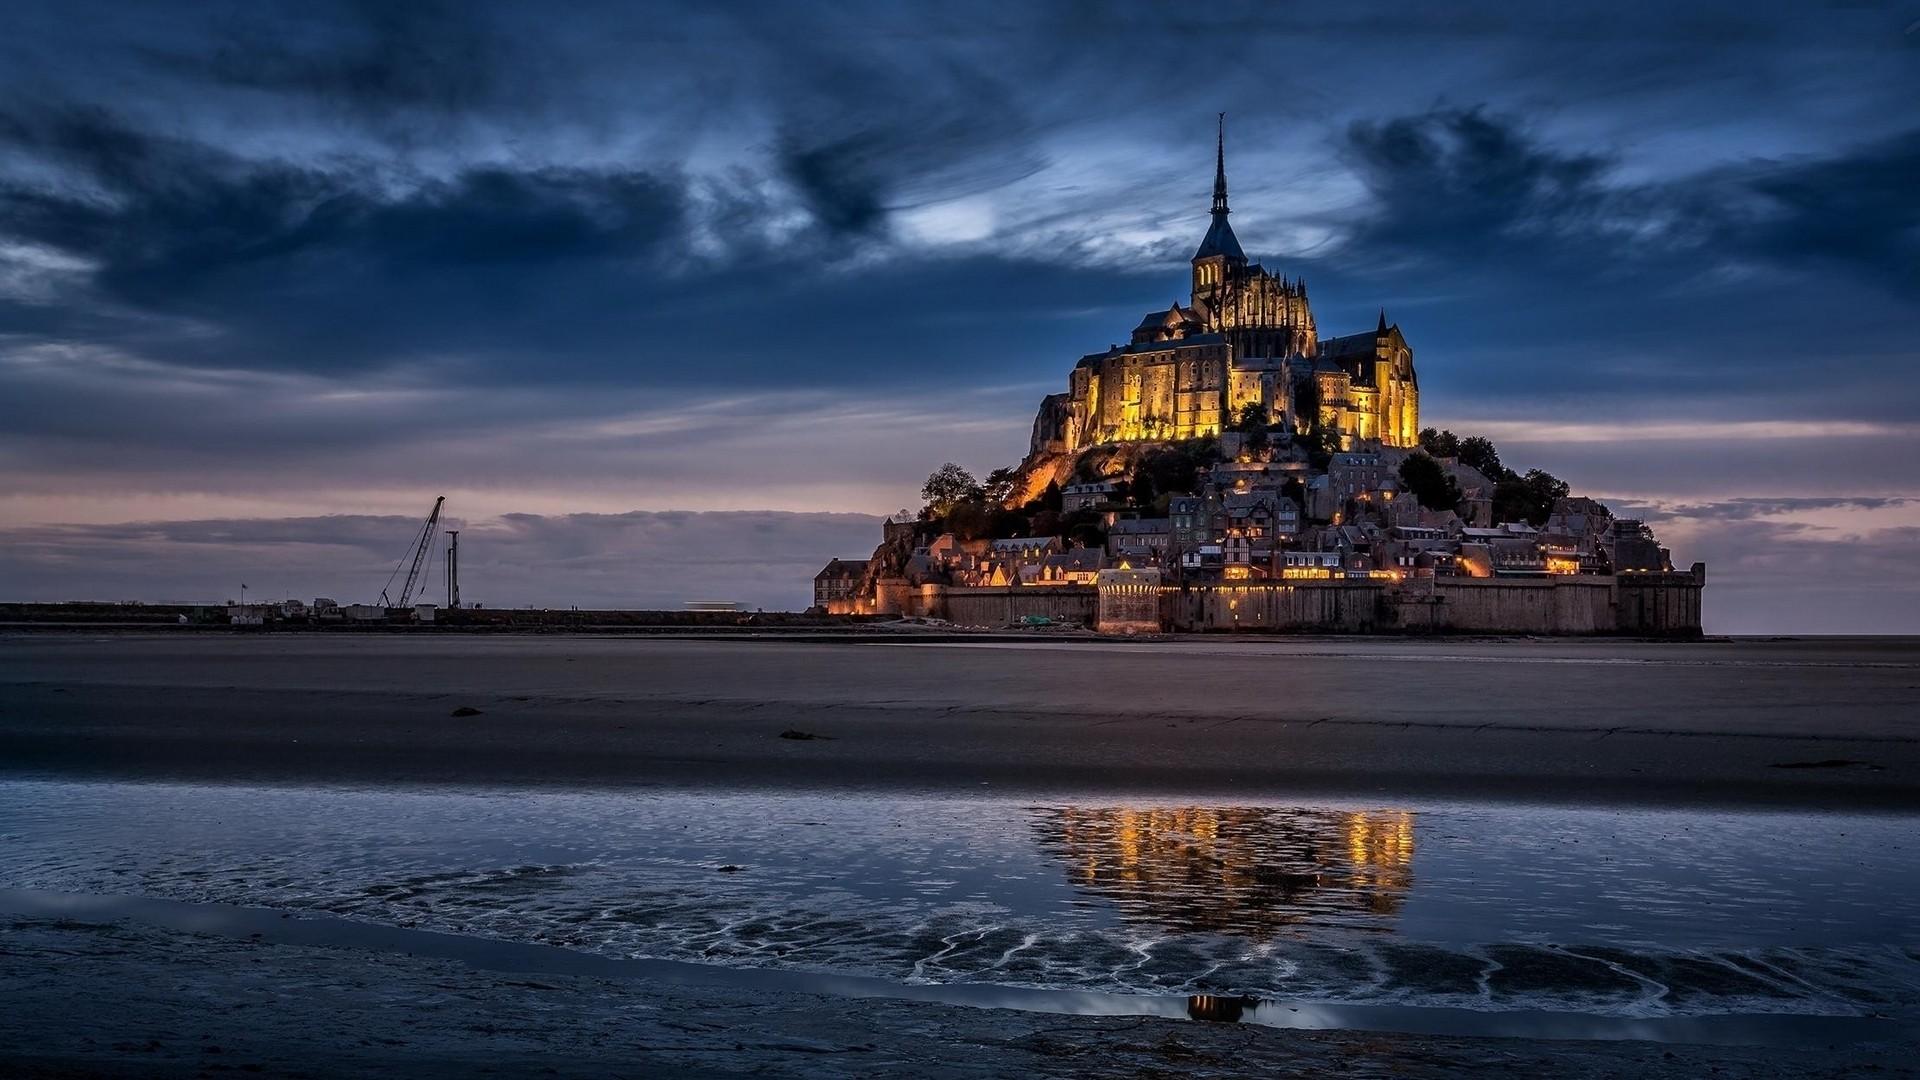 General 1920x1080 Mont Saint-Michel island Abbey city lights fort town night castle